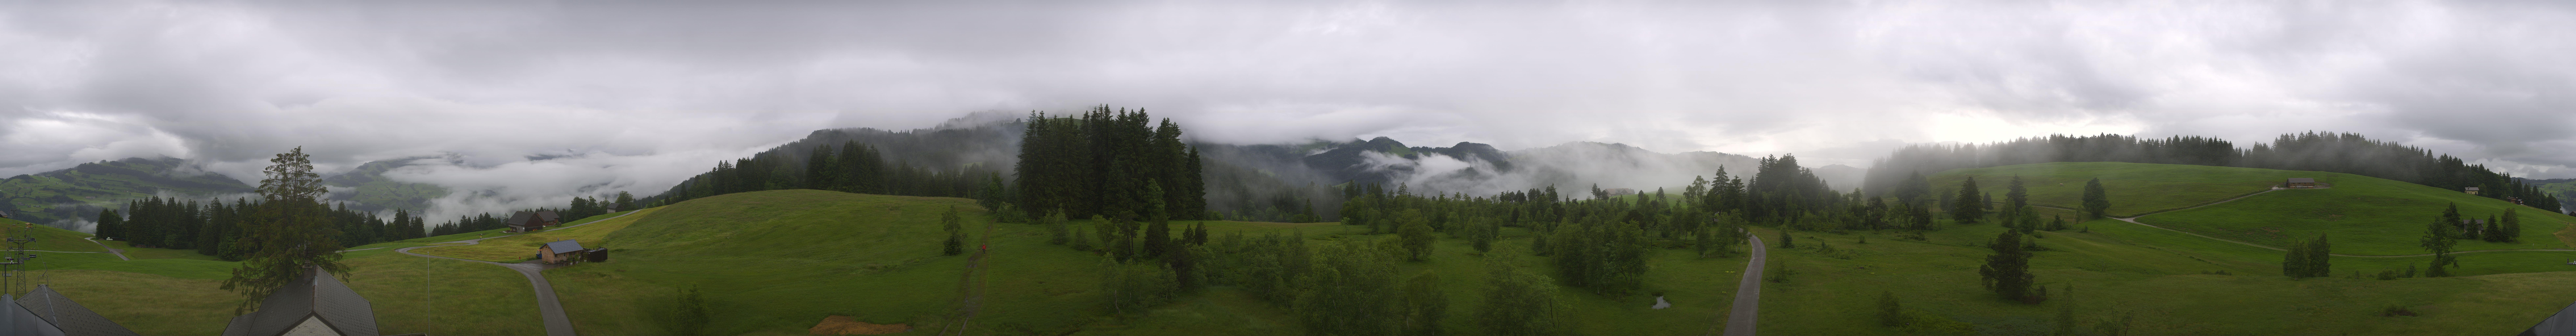 Nesslau: Wolzenalp - Krummenau - SG